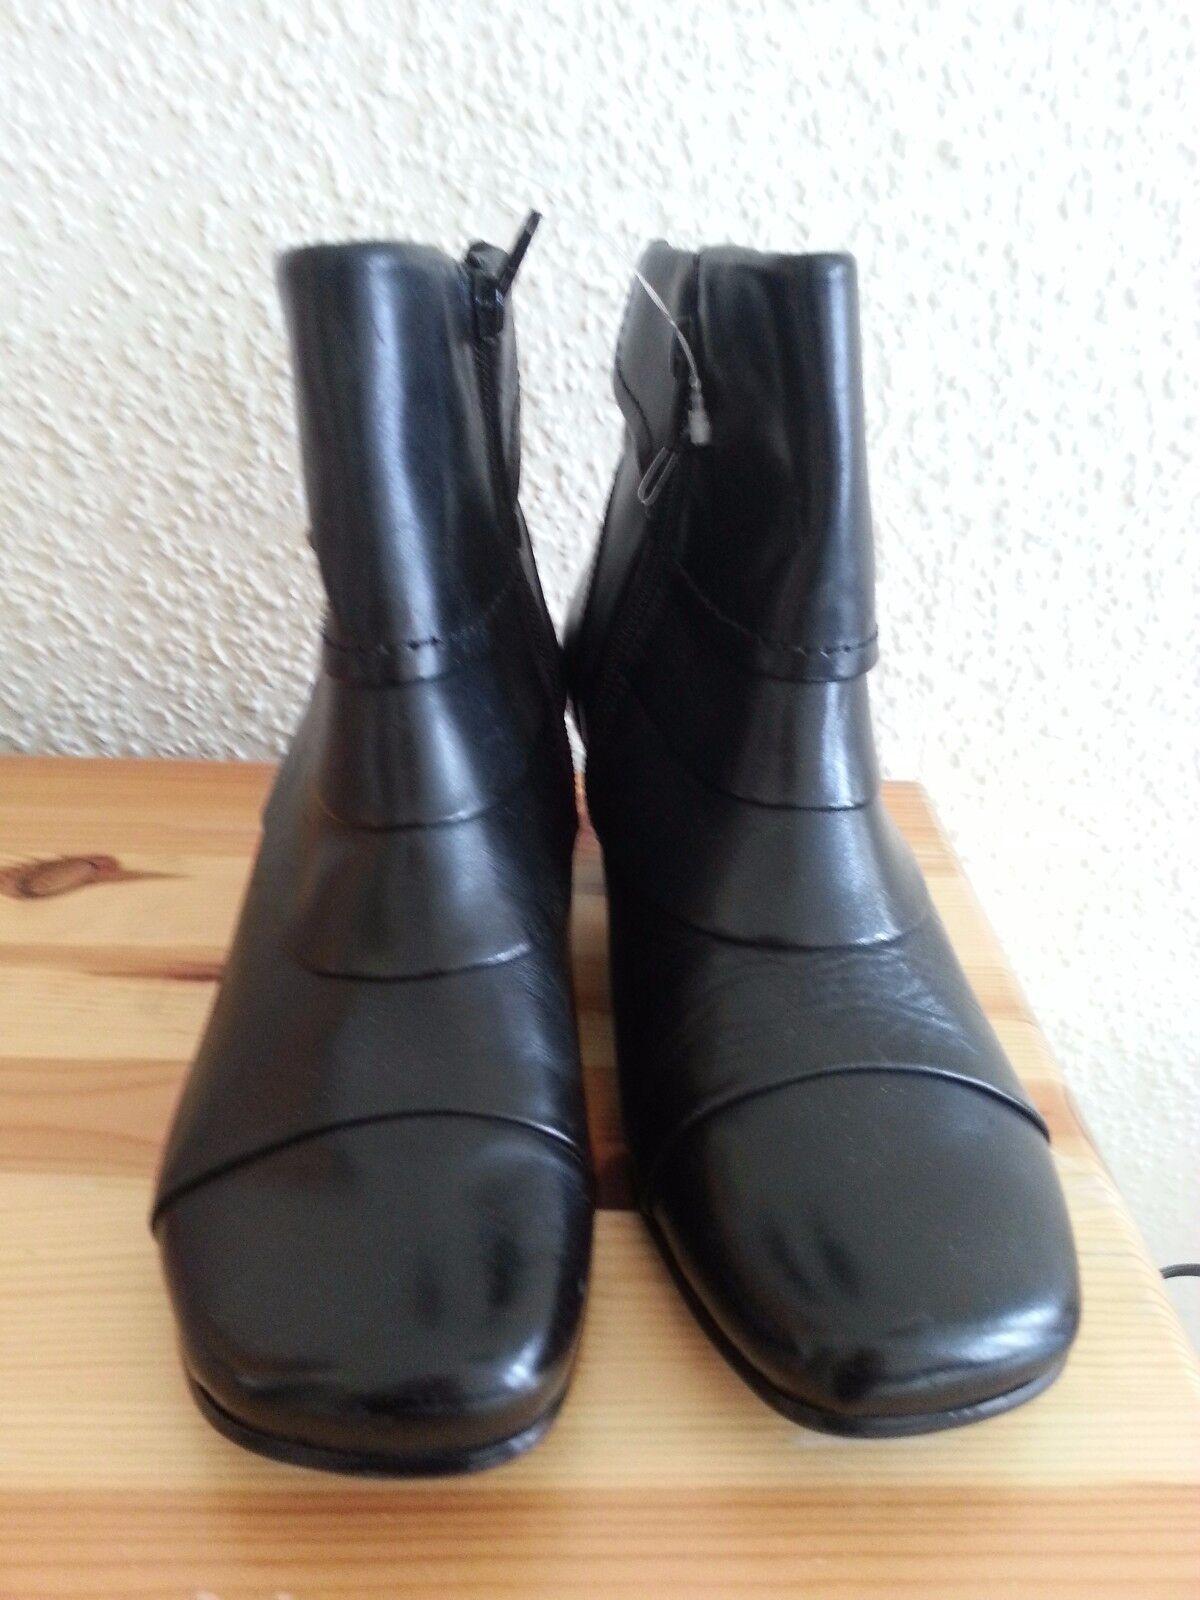 NEU Hush Puppies Damen Stiefel Gr 36 echt Leder warmfutter schwarz LP